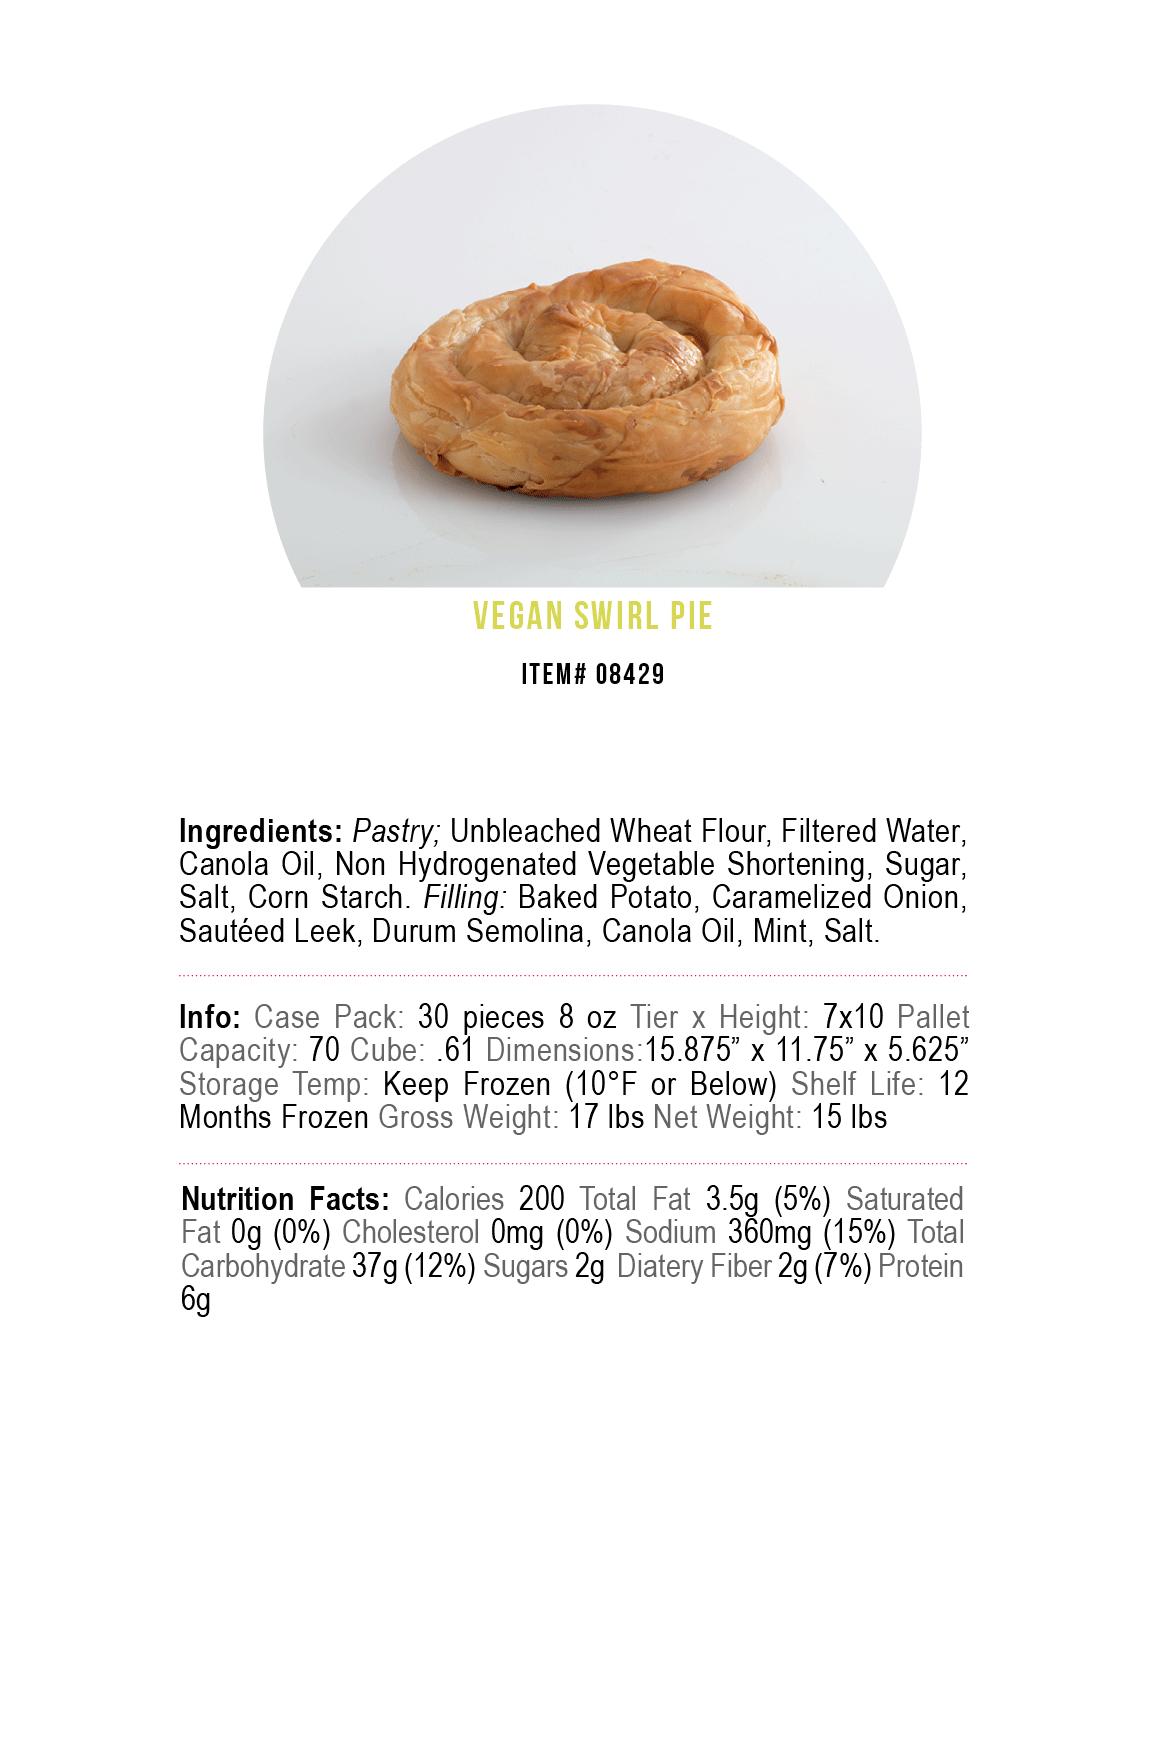 corfu-swirl-pies-vegan.png